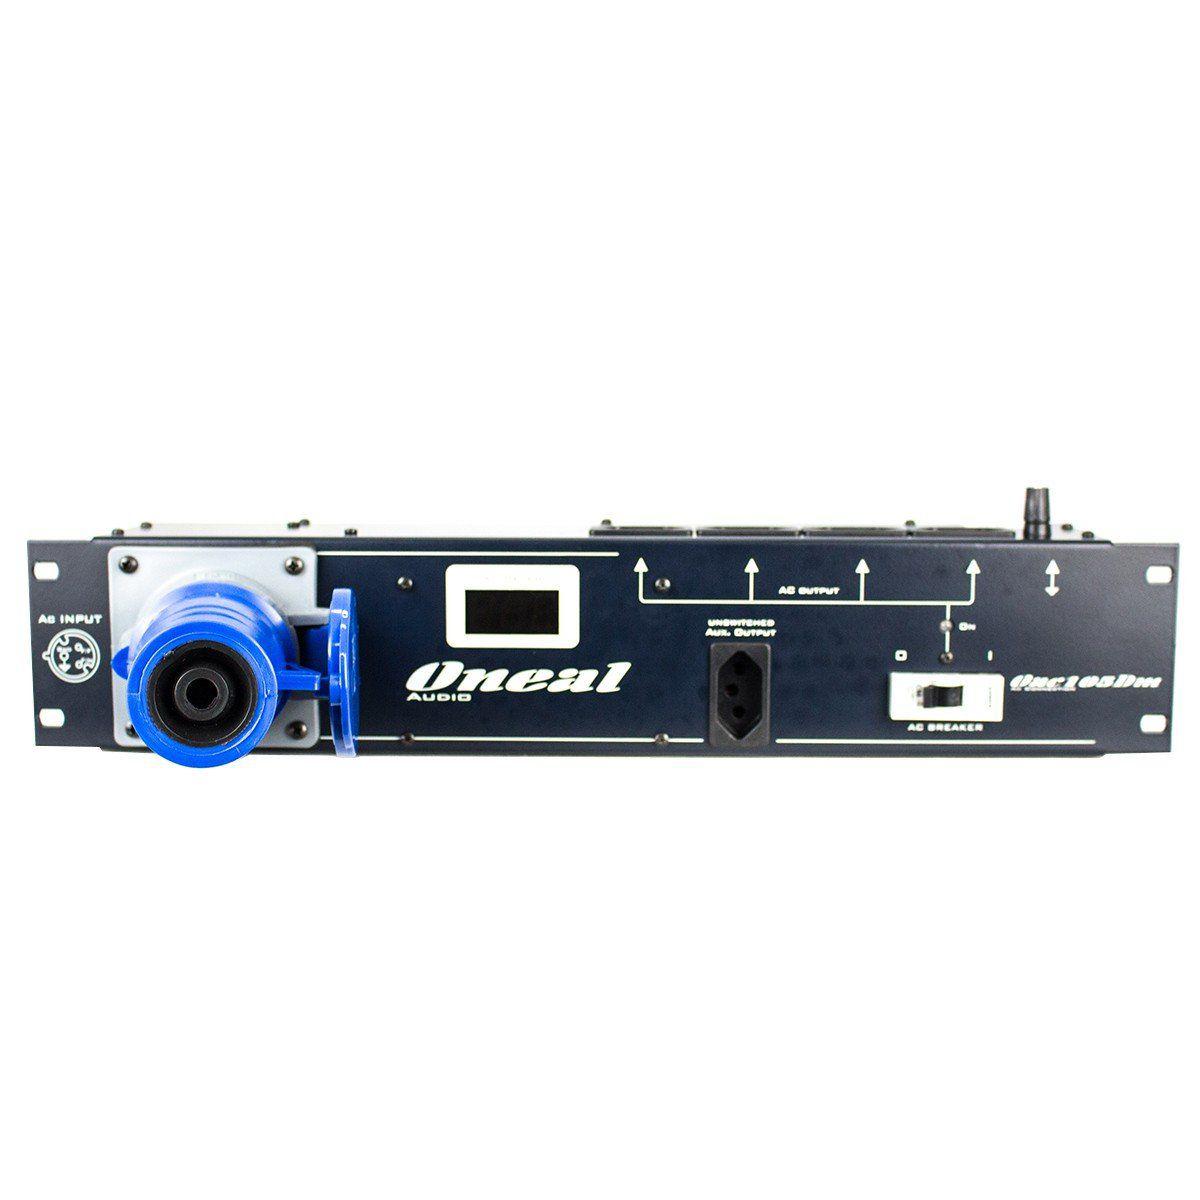 OAC105DM - Filtro de Linha / Régua de Energia 11000W OAC 105 DM - Oneal